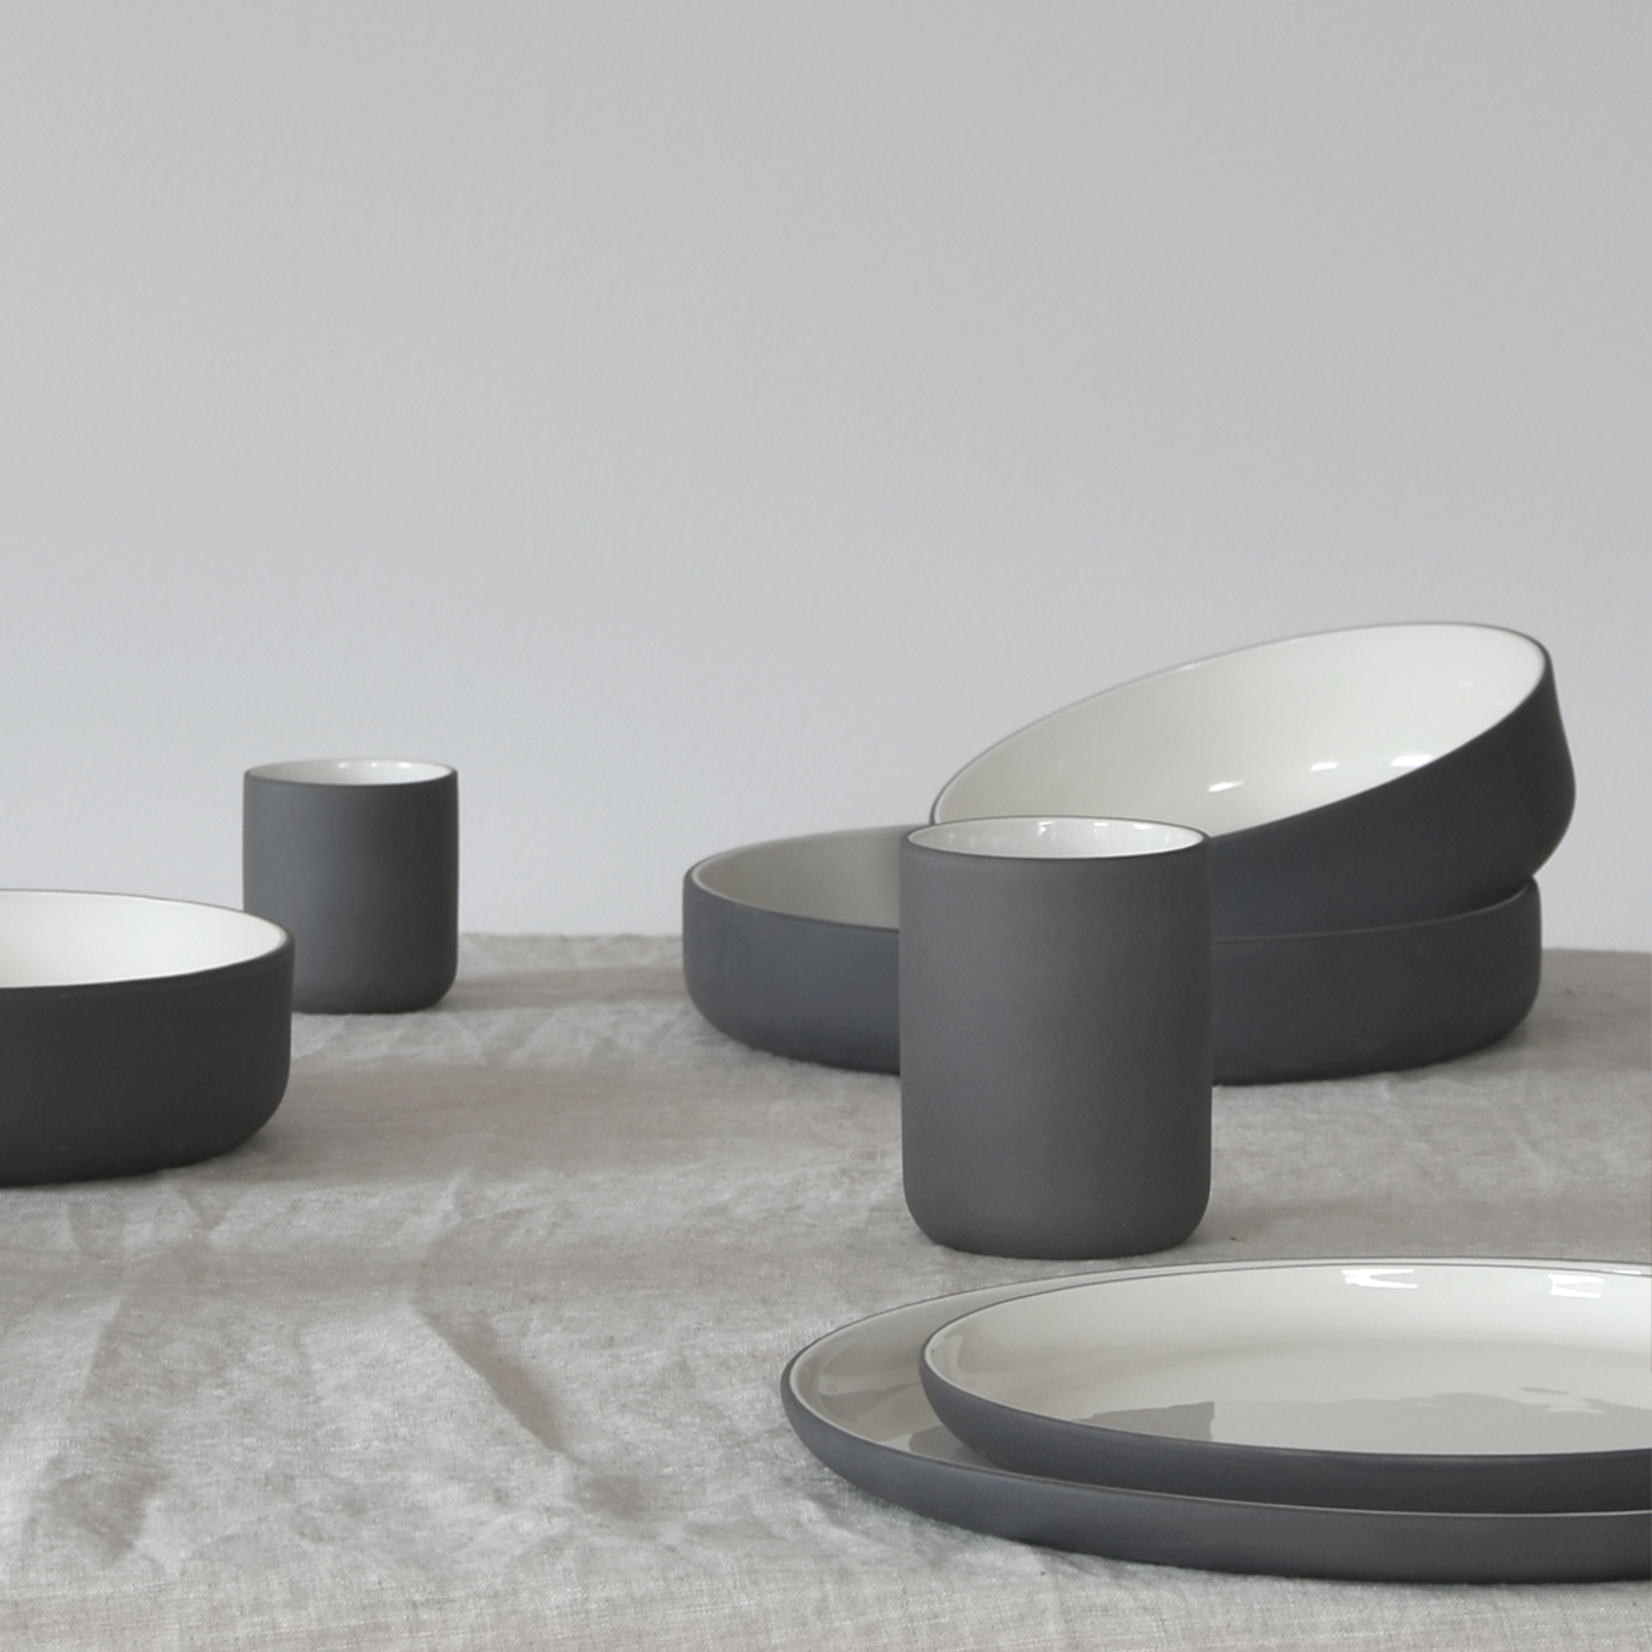 "Archive Studio Archive Studio Handmade Plate 10"" Dark Grey"